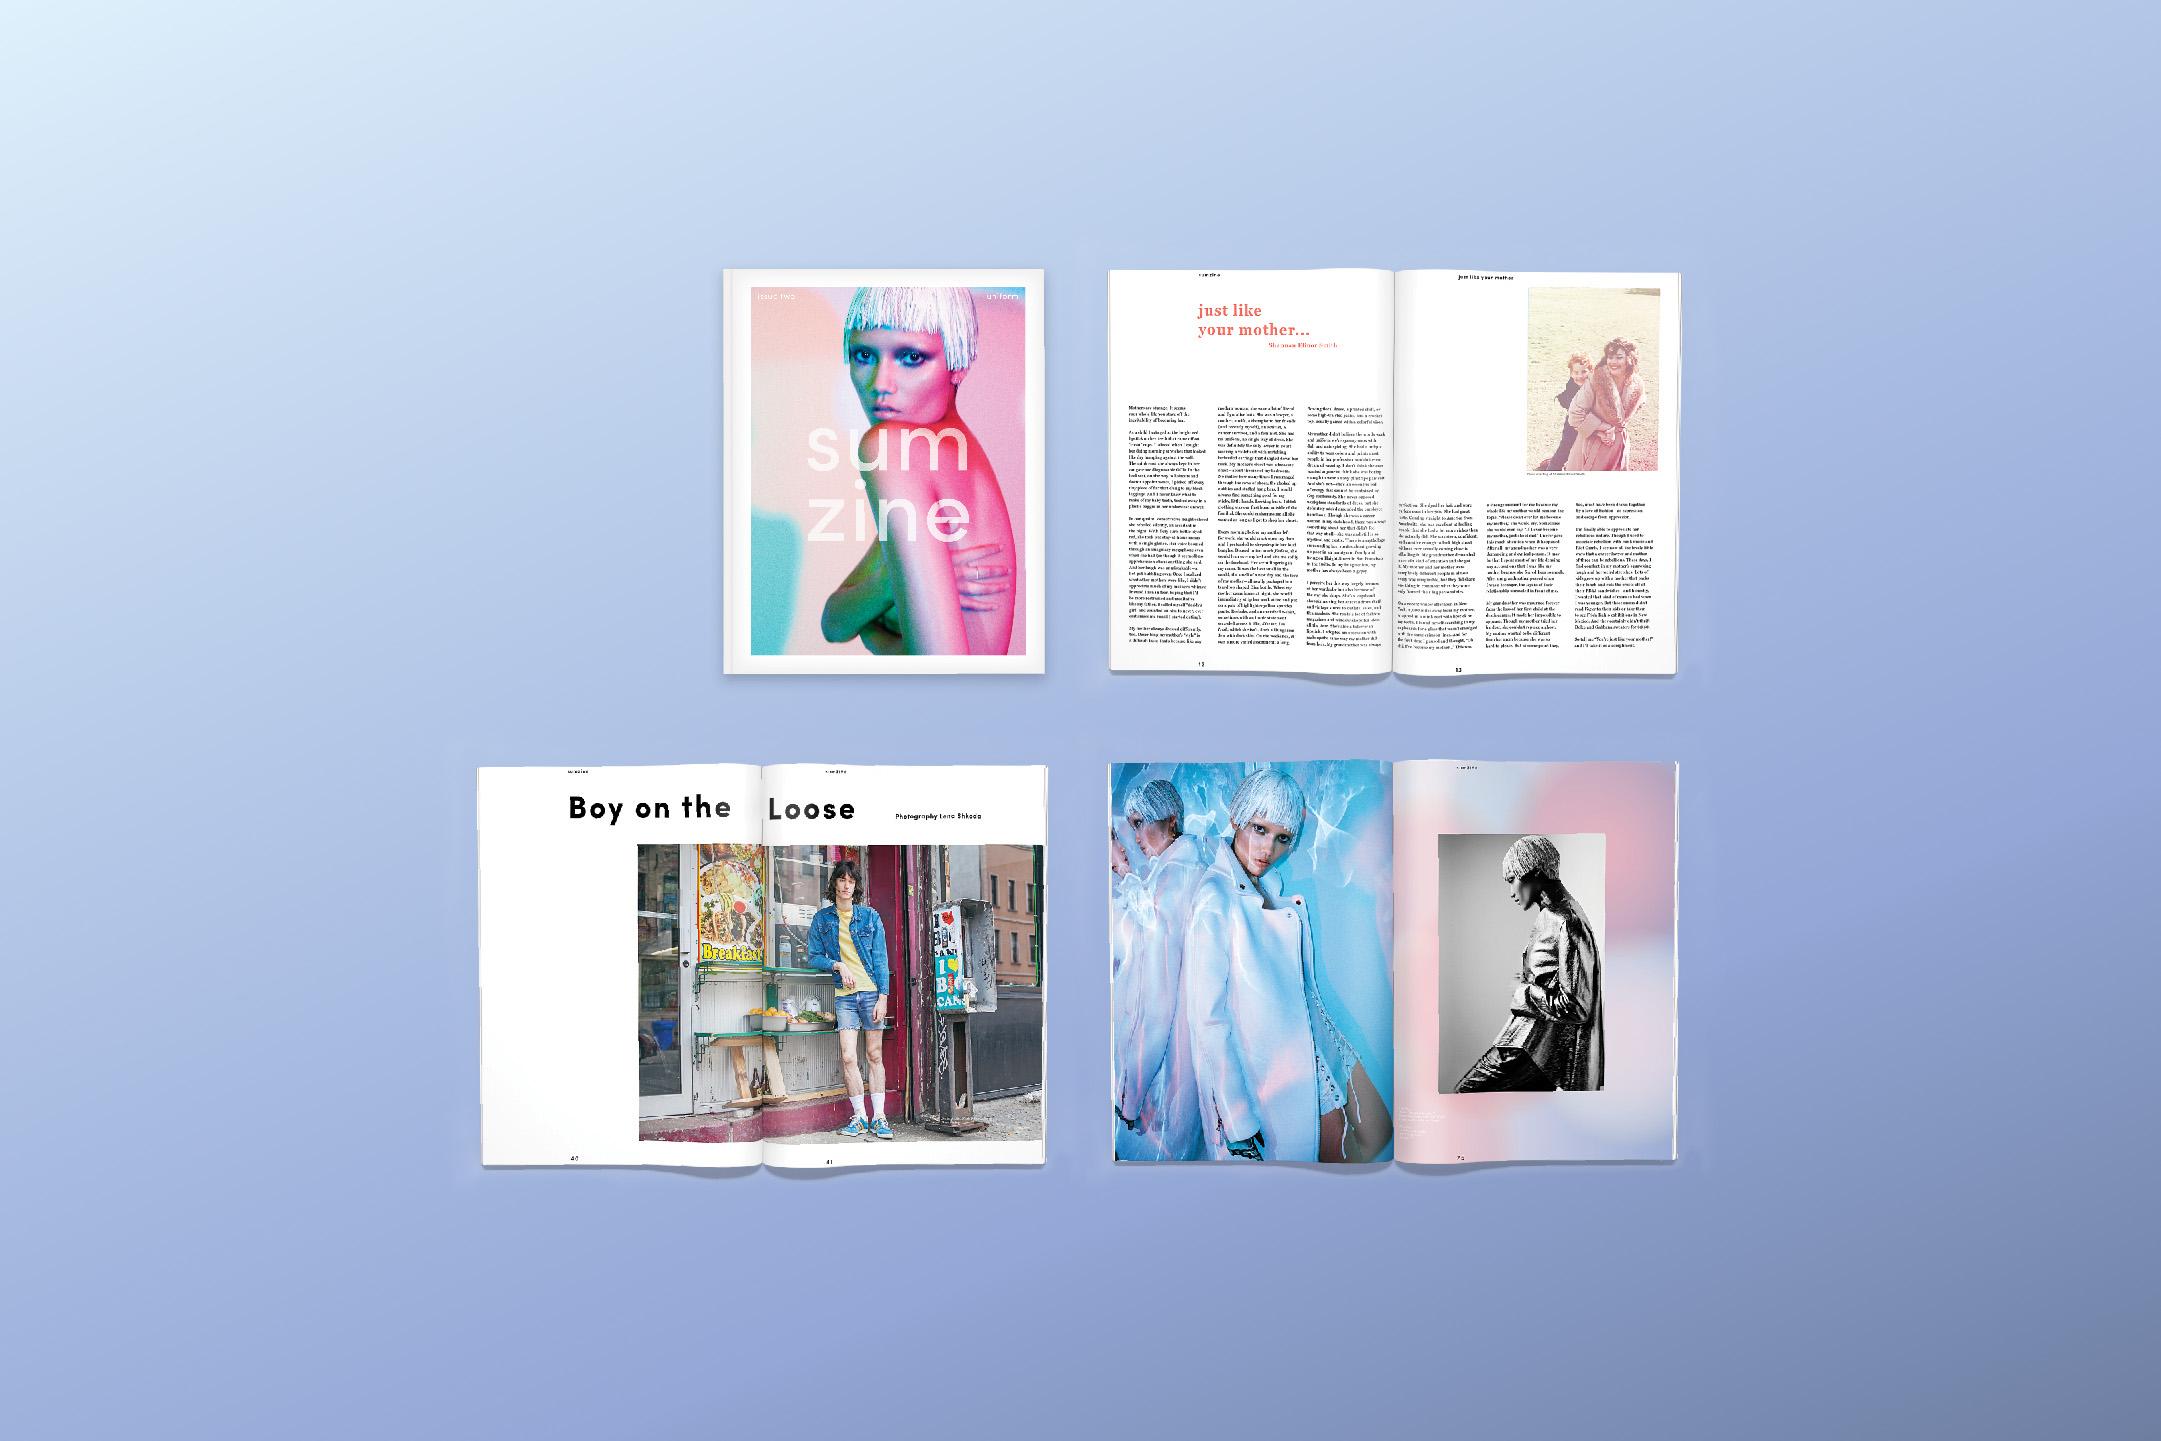 Sumzine-layouts-04.jpg